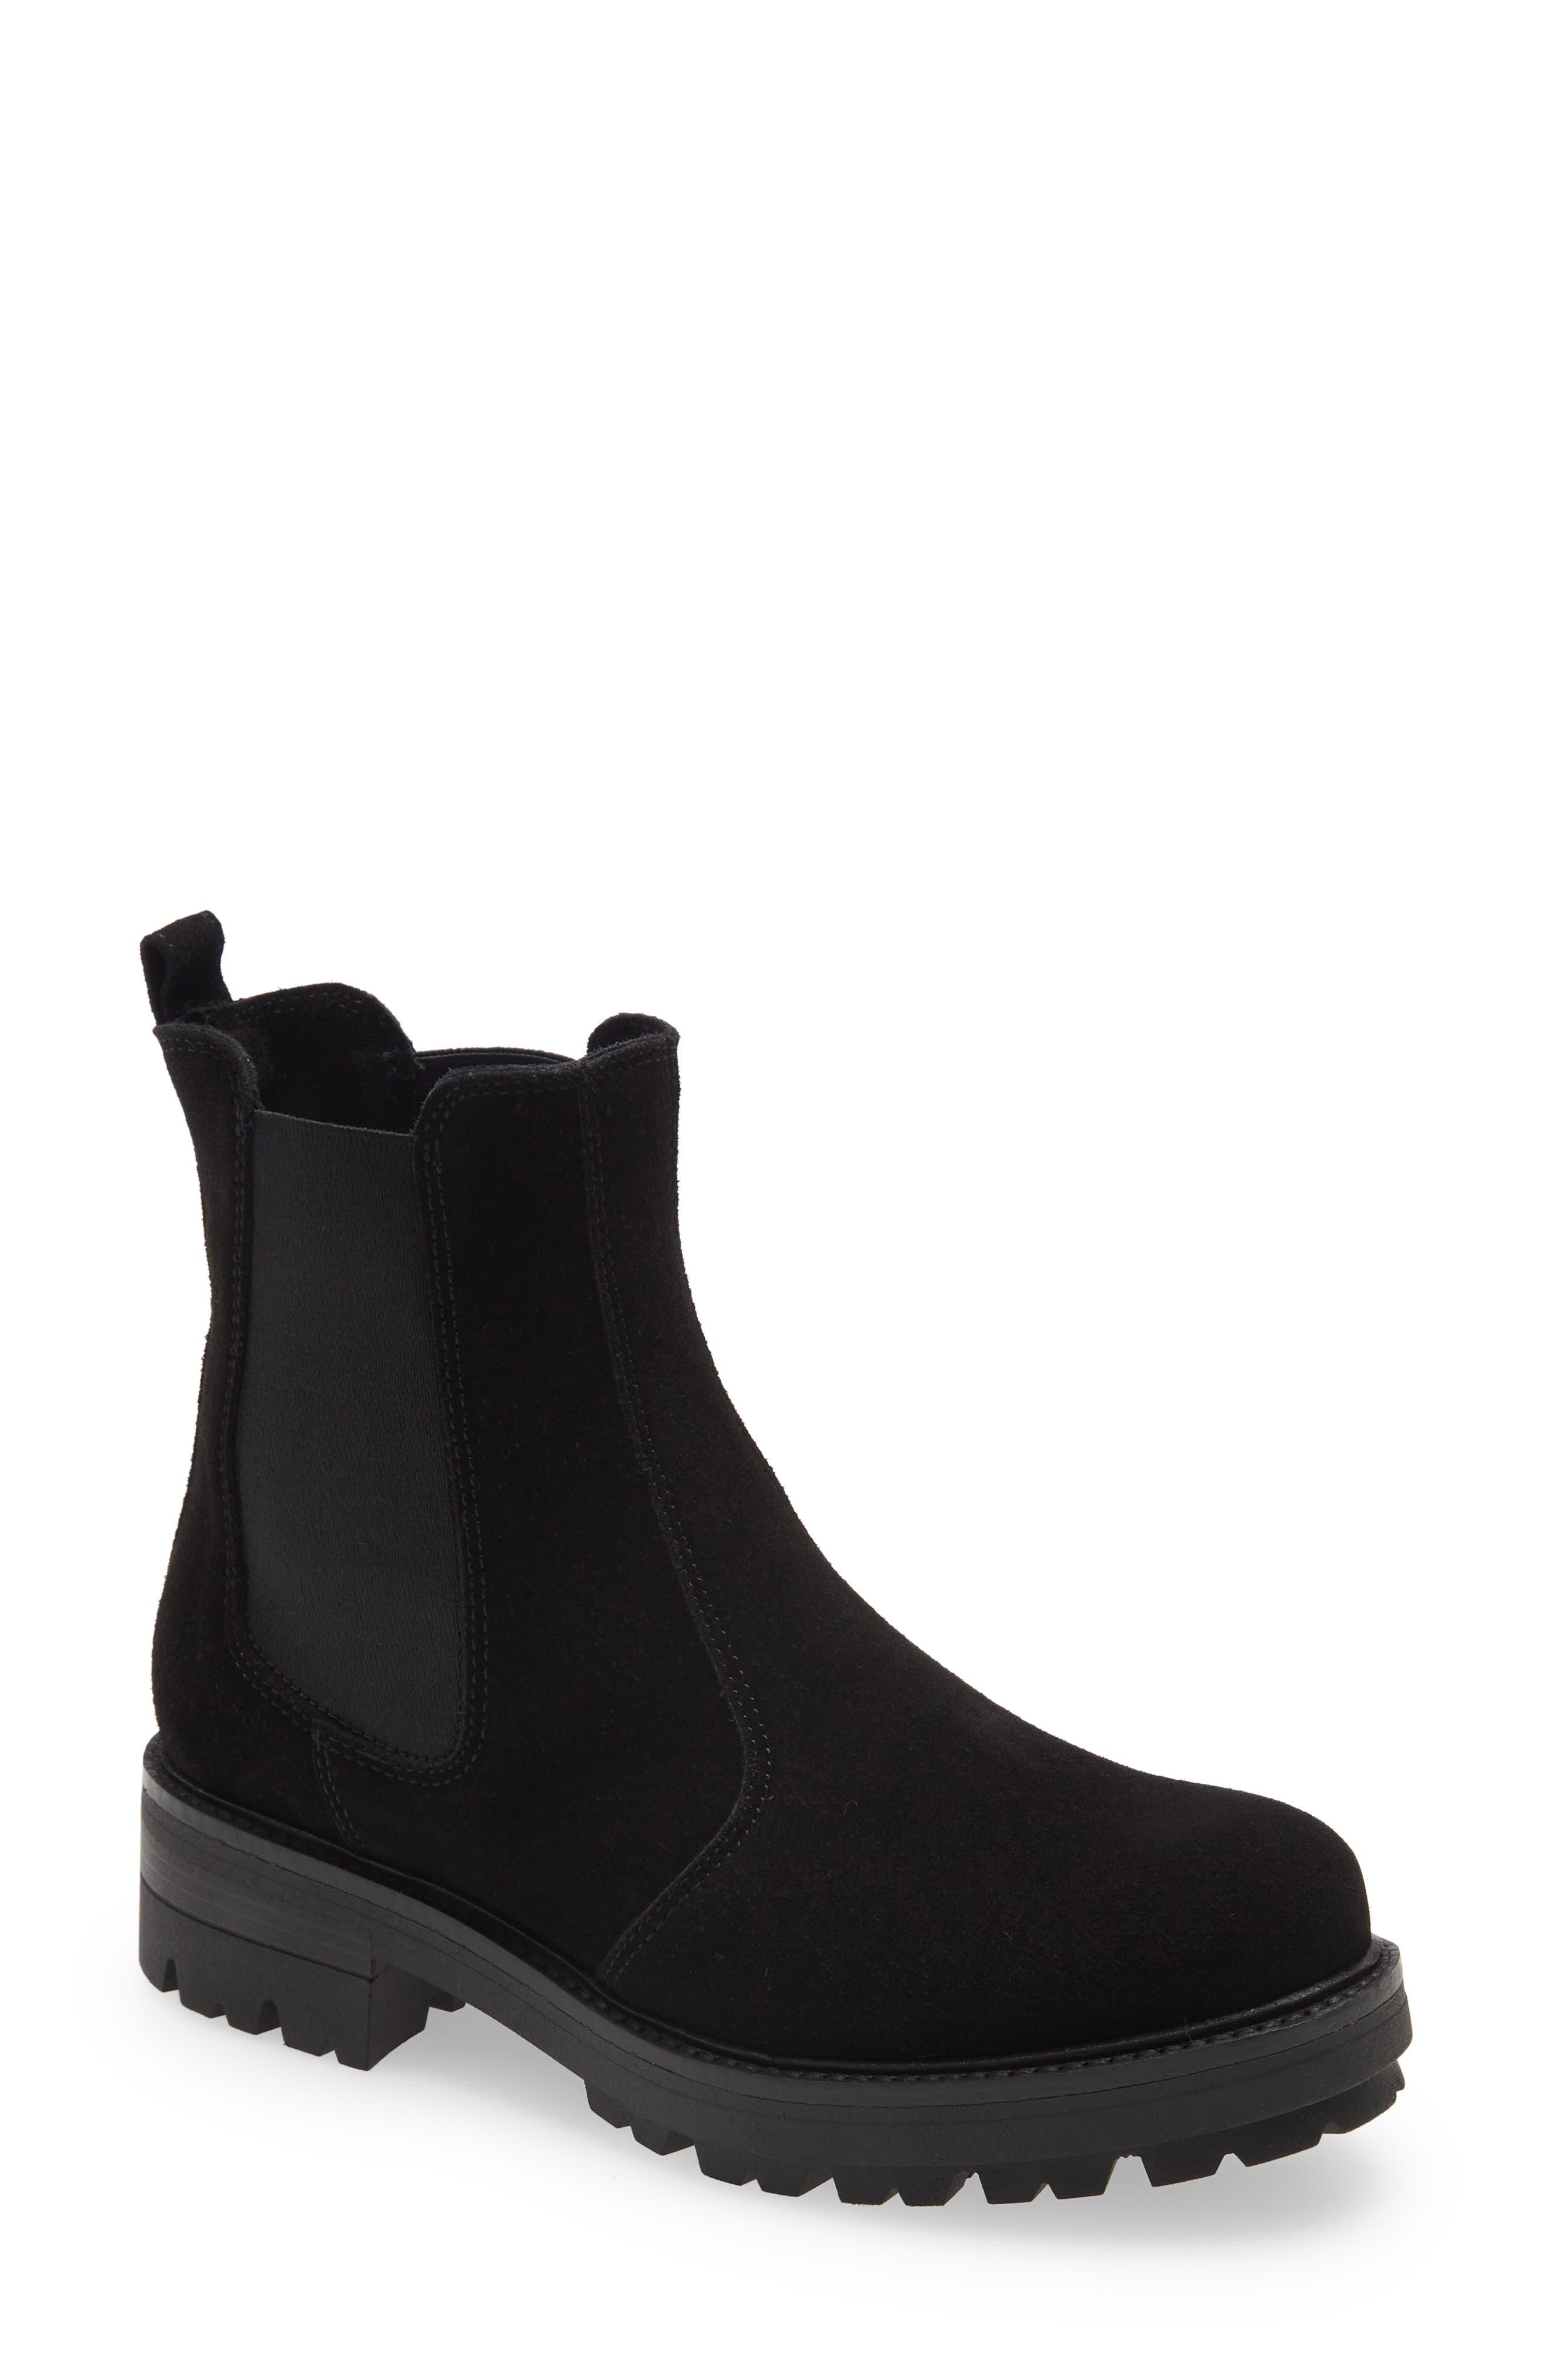 Cassy Waterproof Chelsea Boot